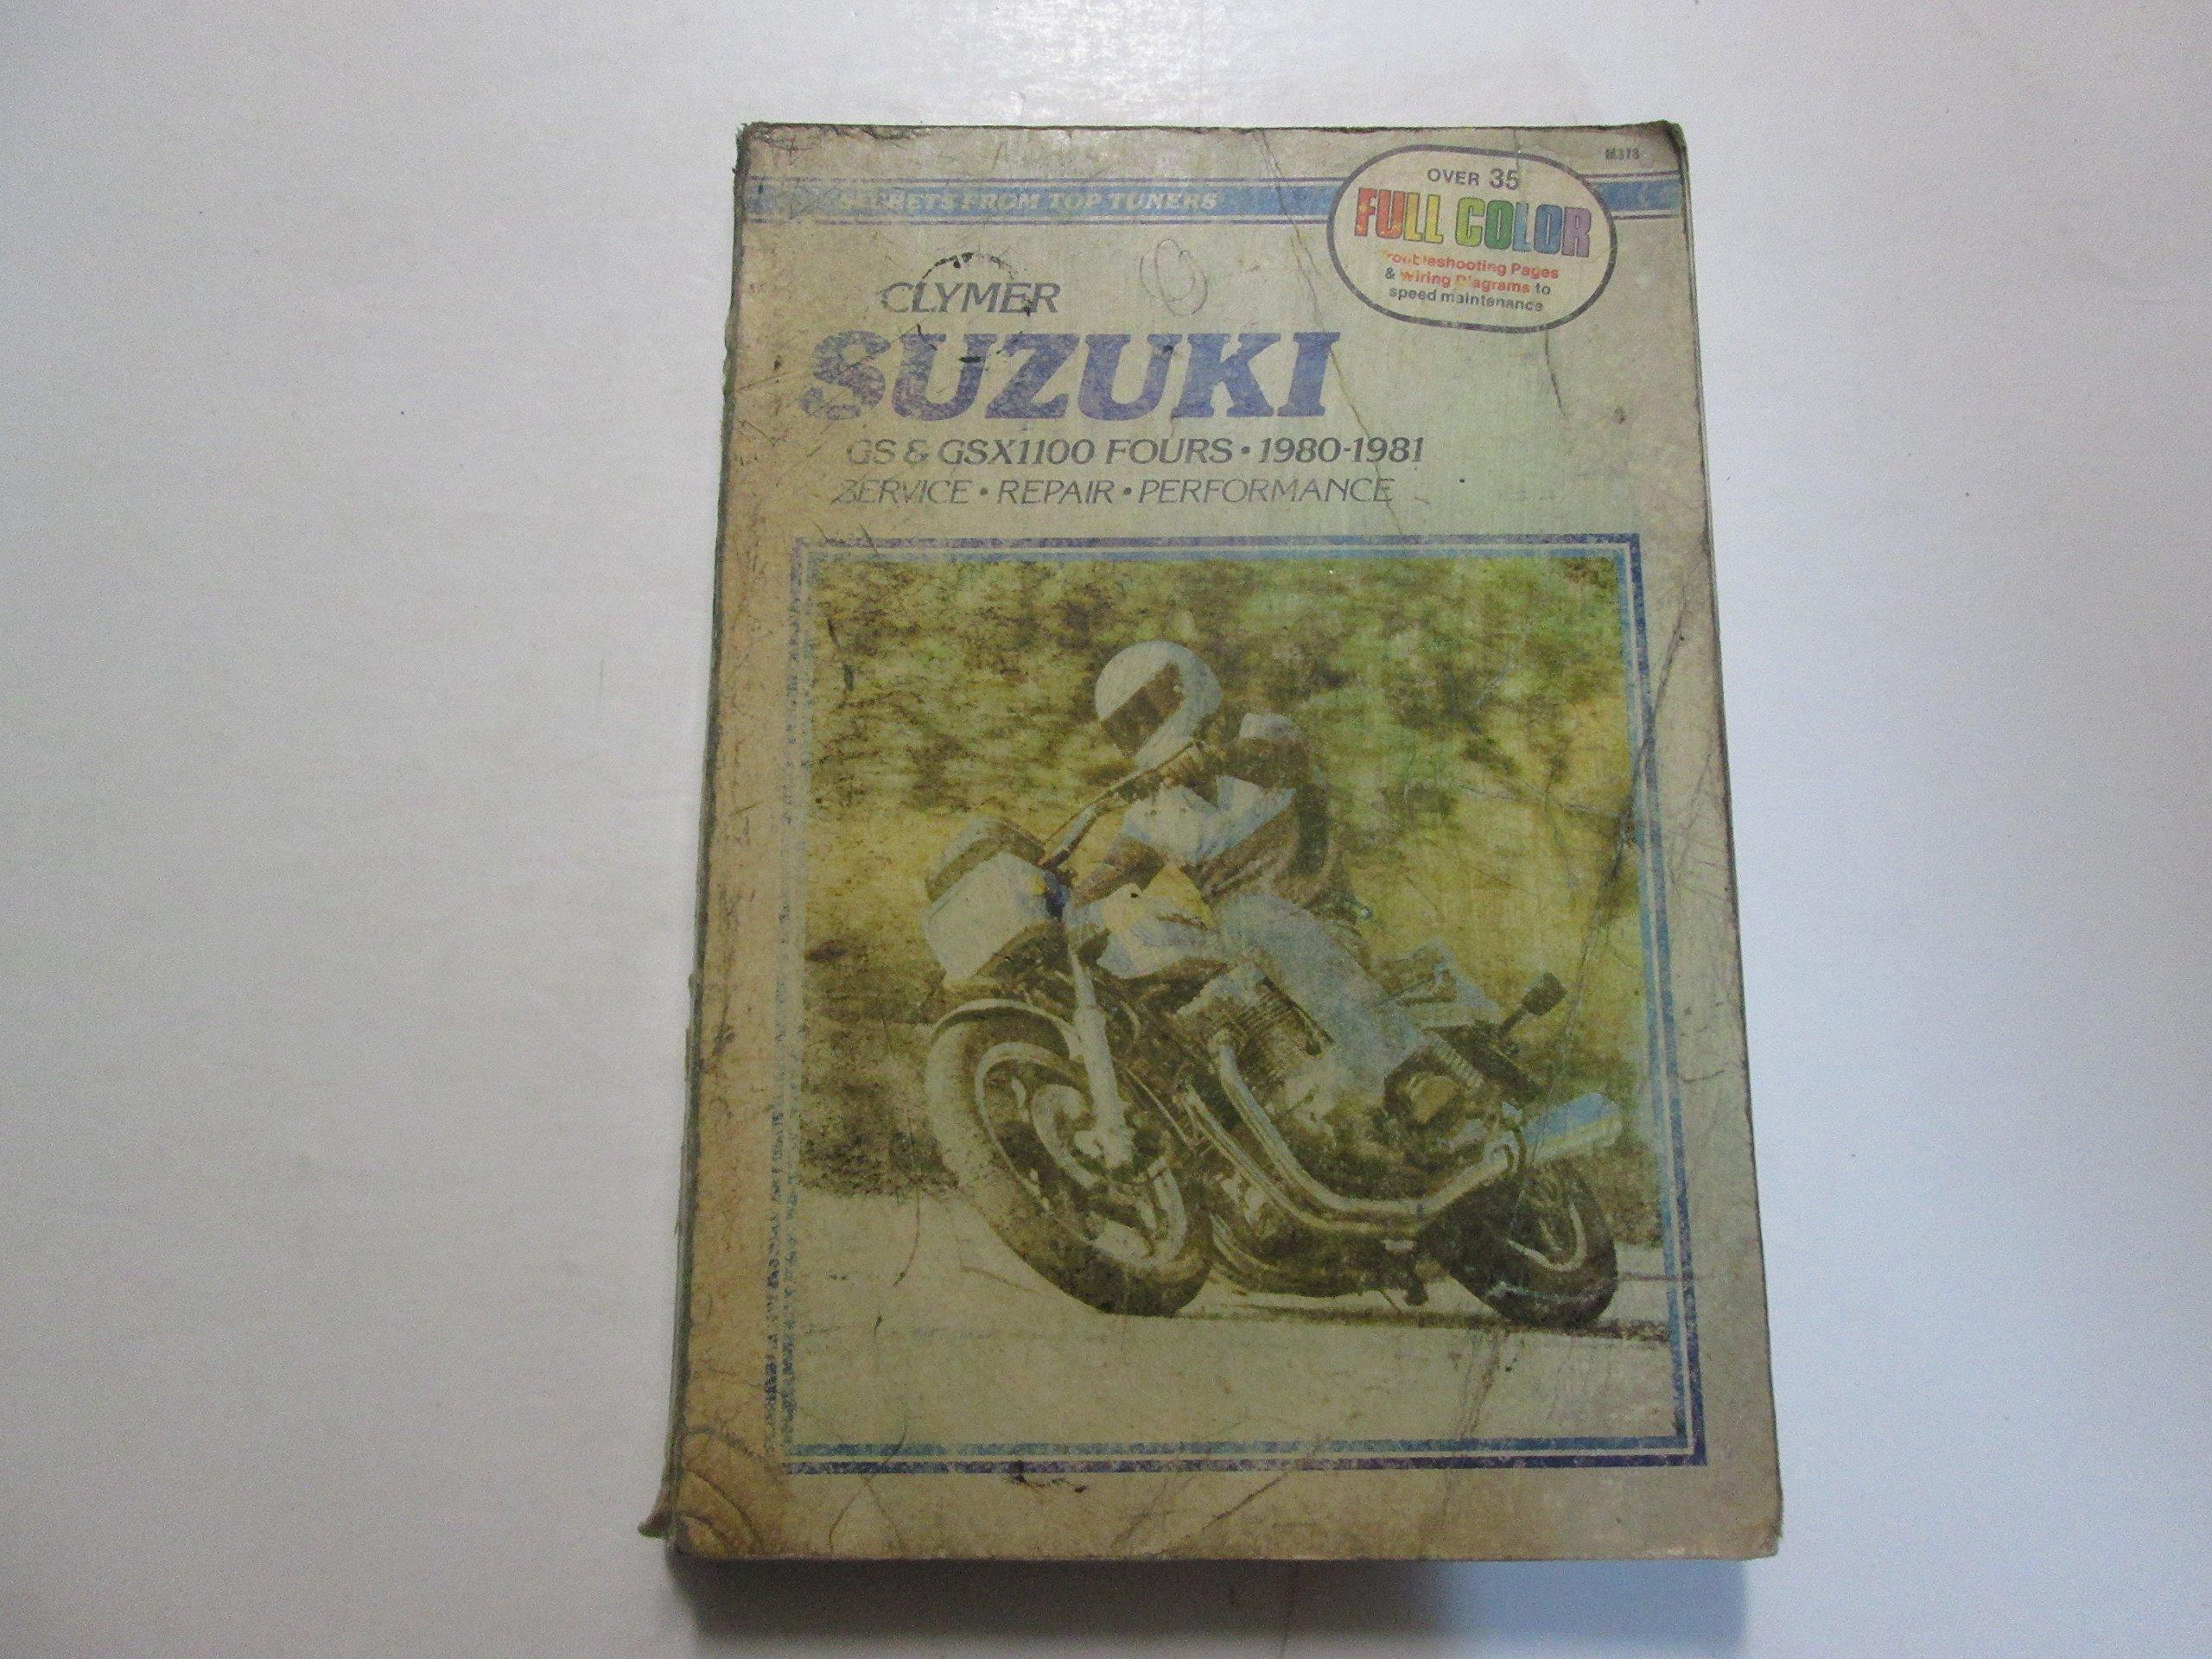 1980 1981 clymer suzuki gs gsx1100 fours service repair performance manual  worn paperback – 1980